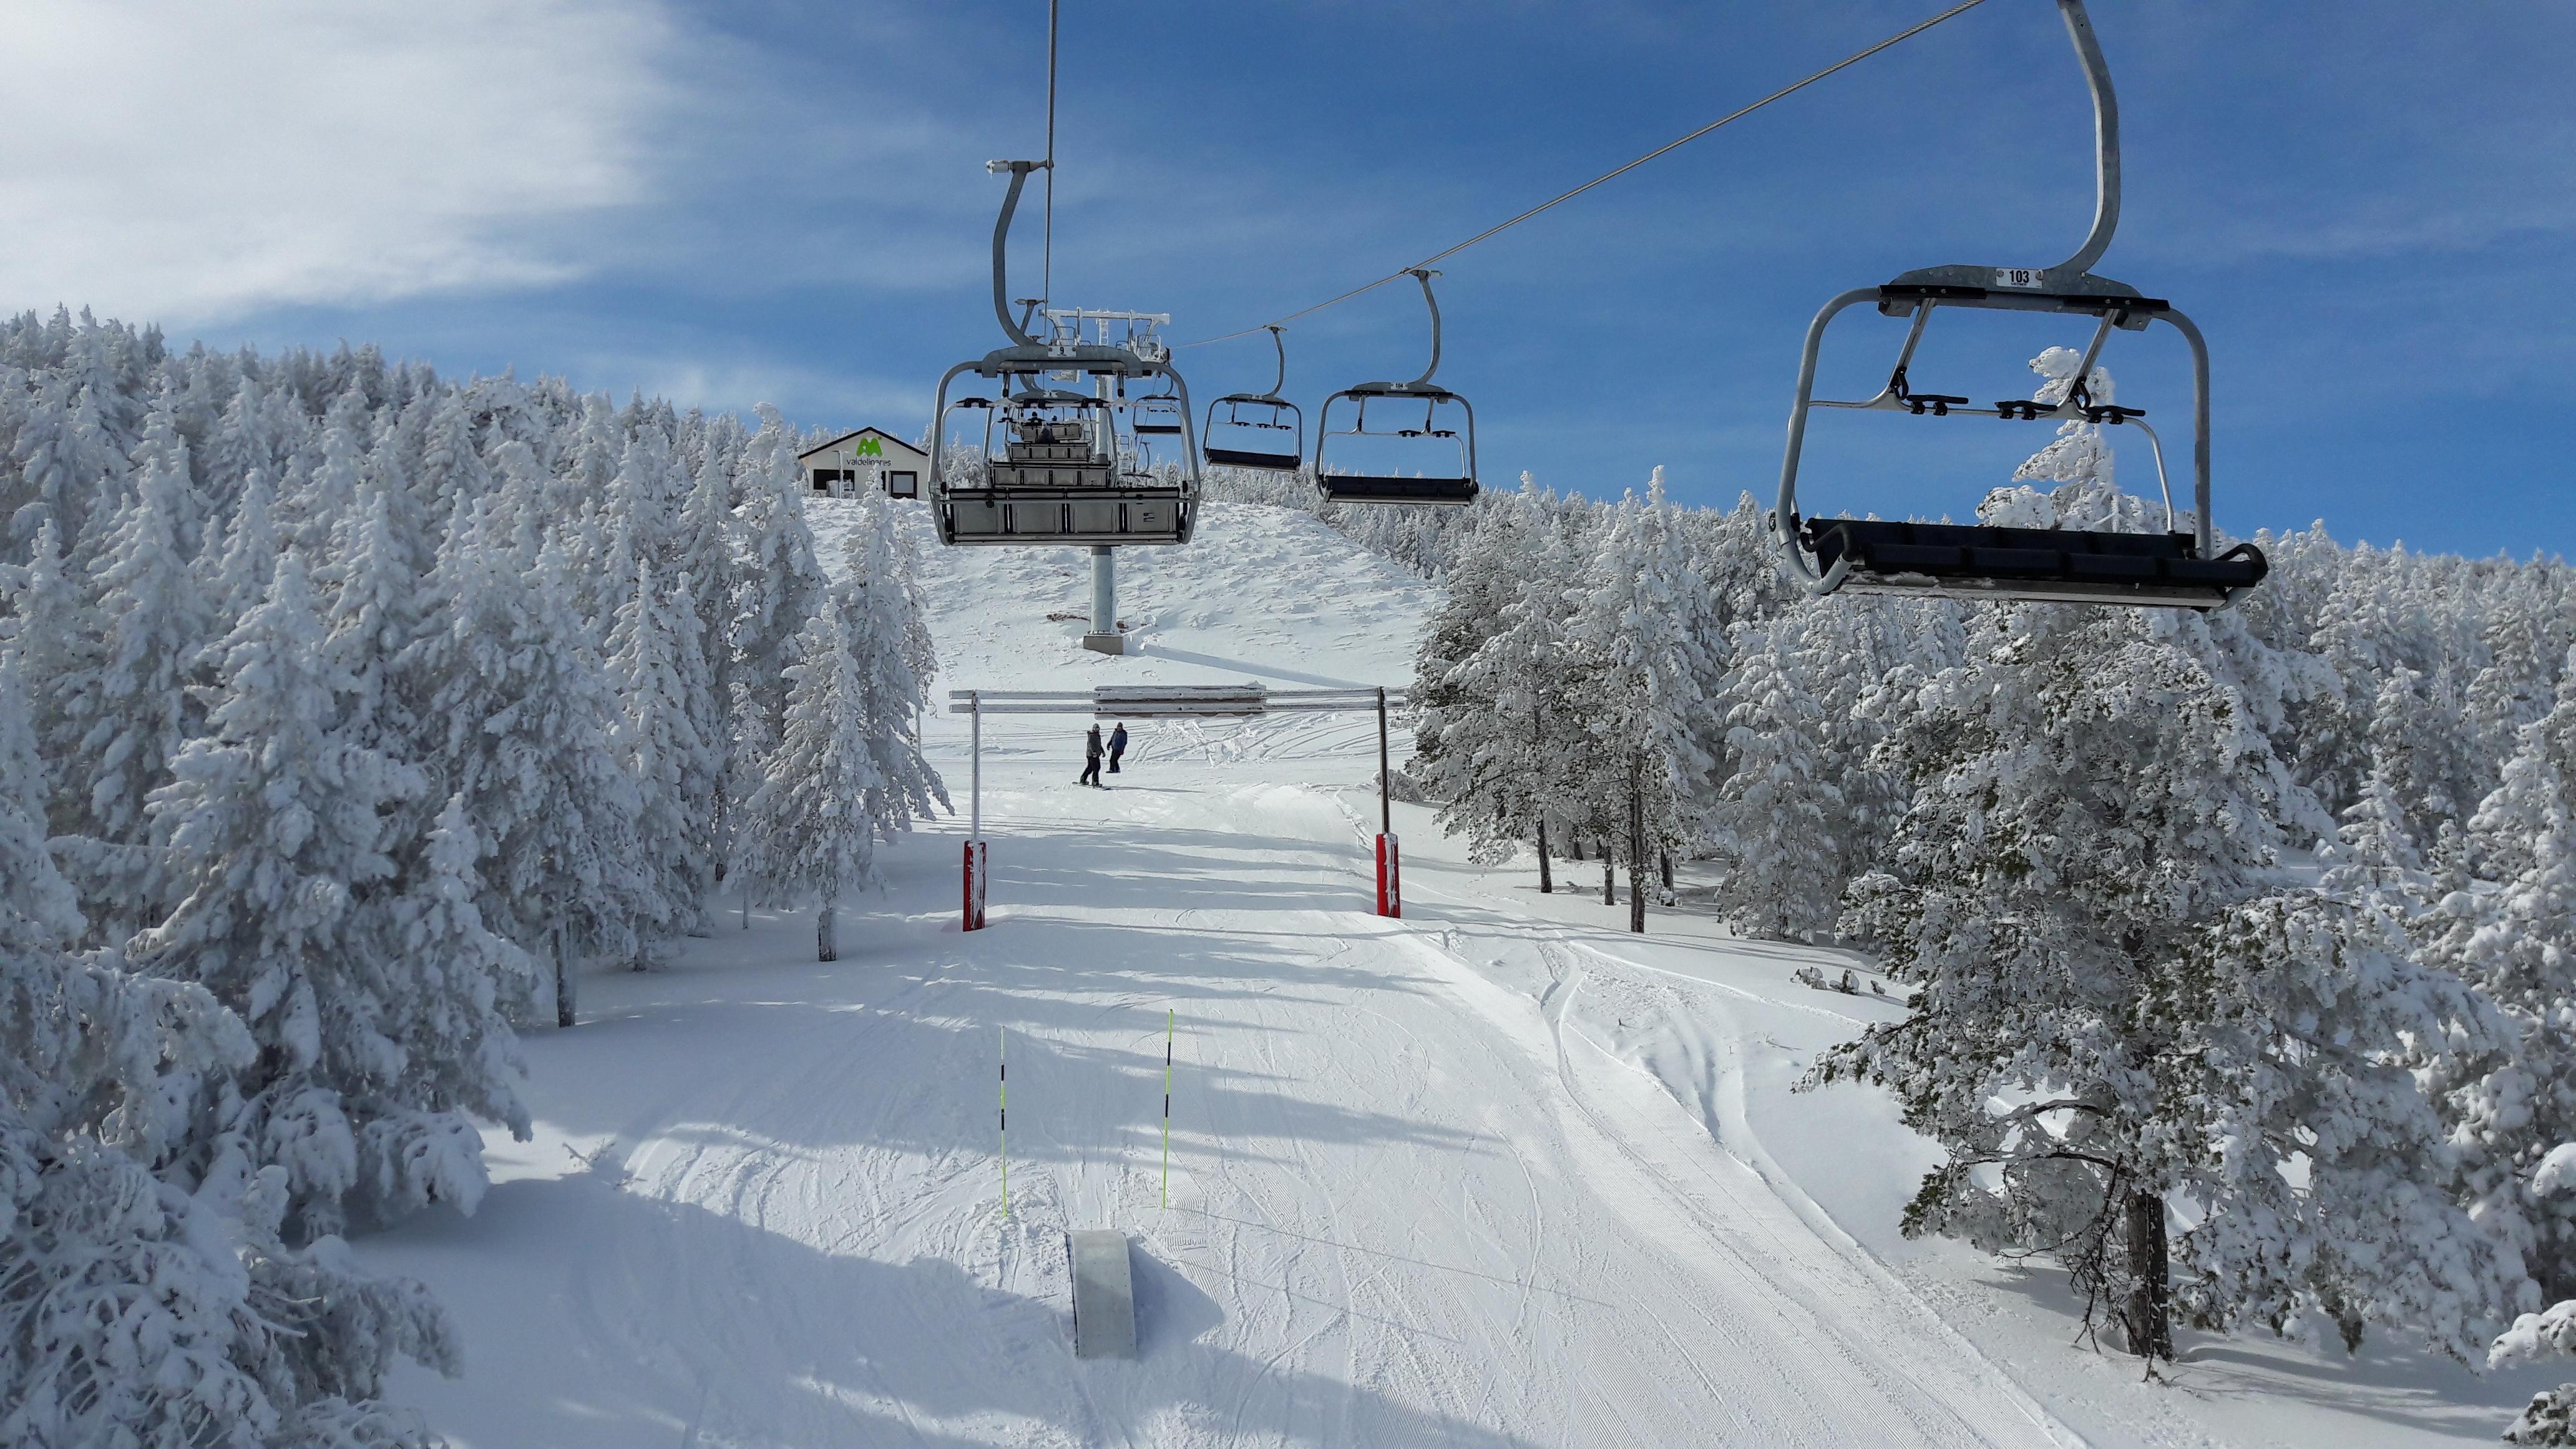 Snowpark Valdelinares